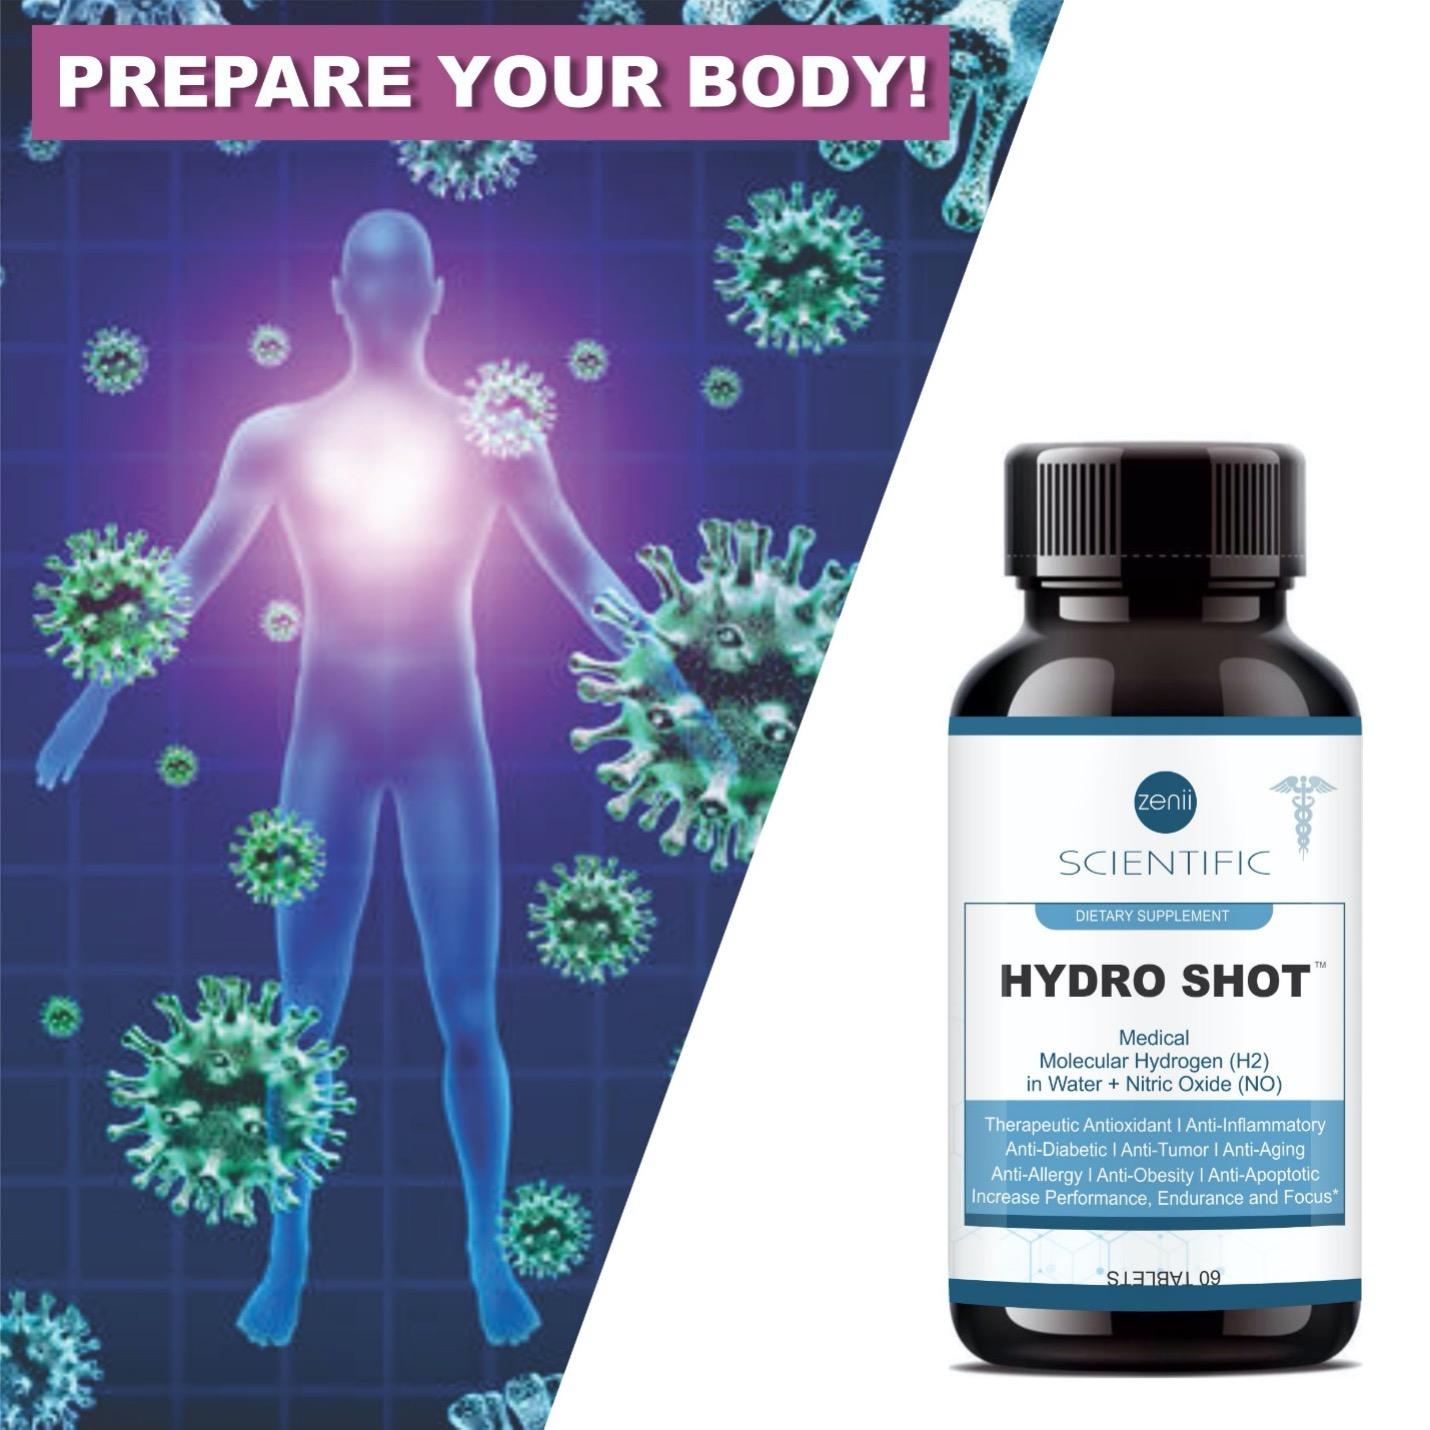 Hydro Shot